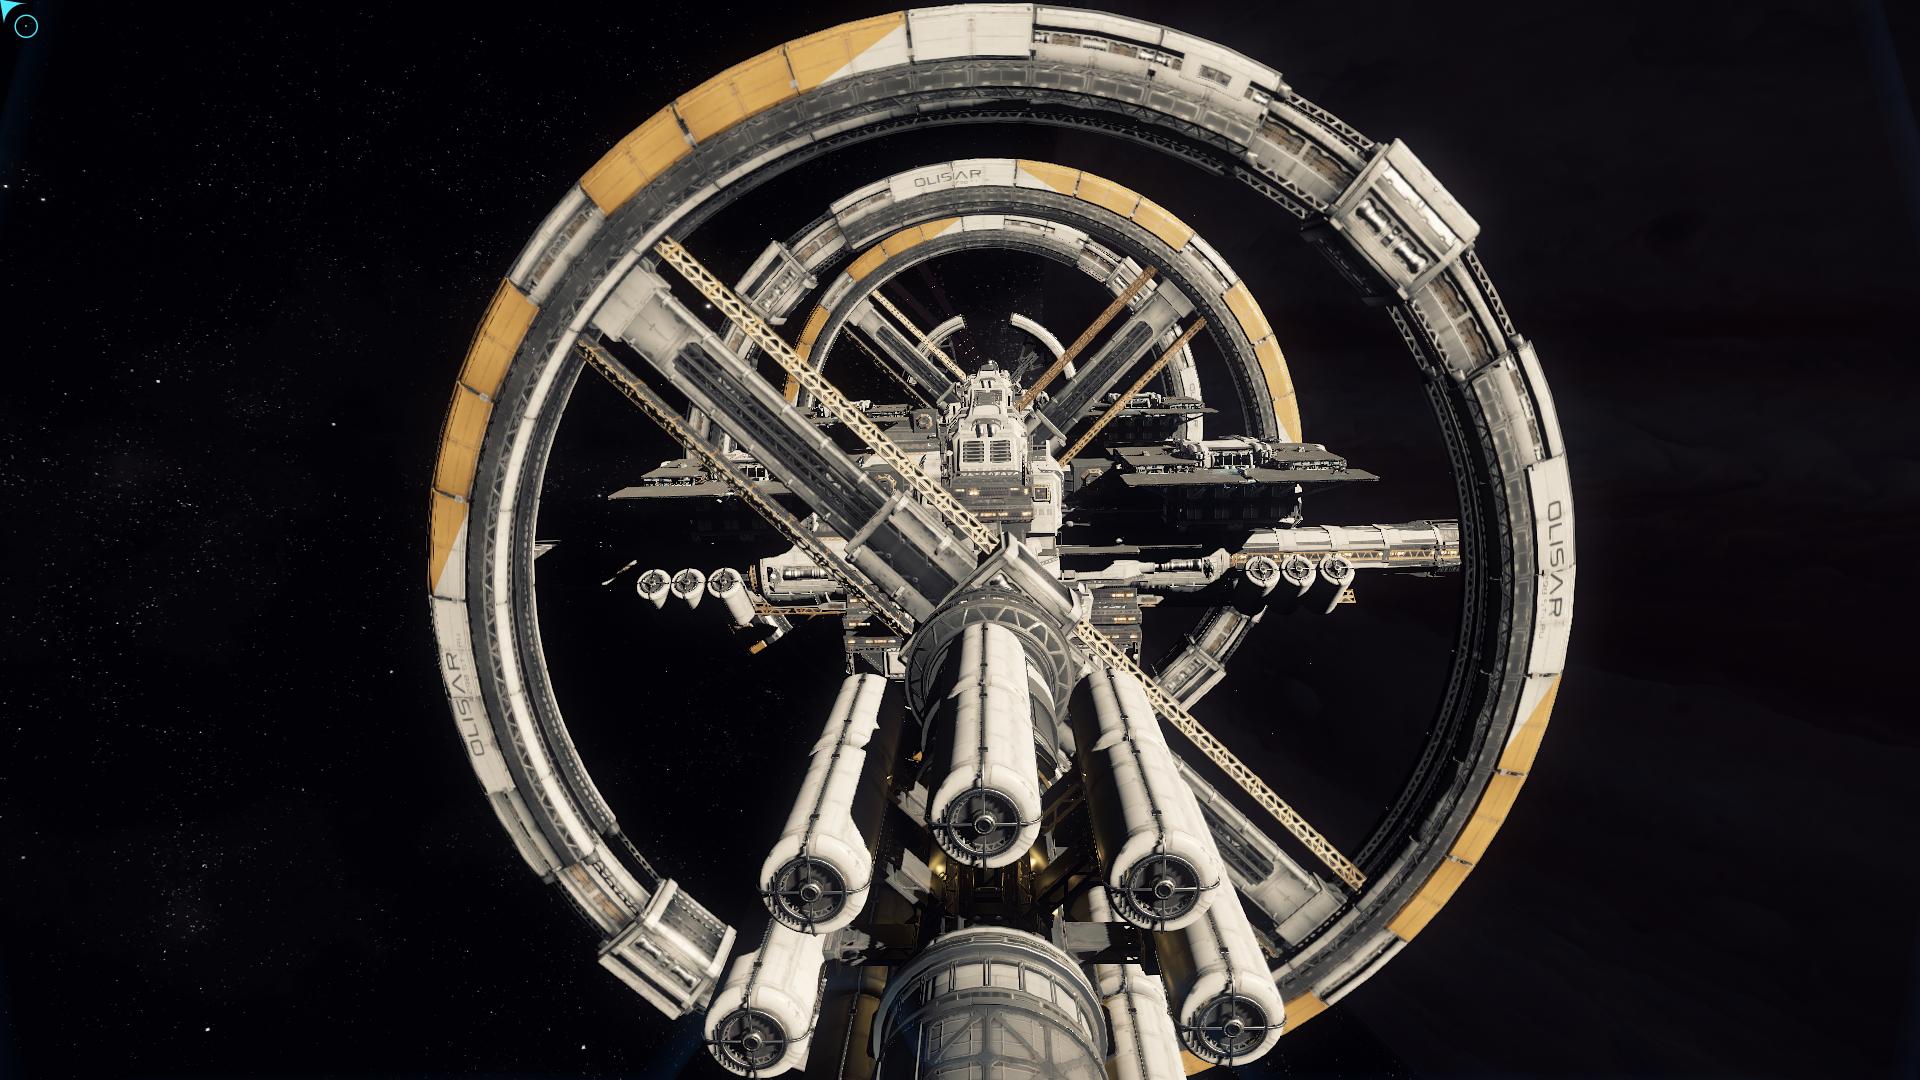 General 1920x1080 Star Citizen space screen shot video games